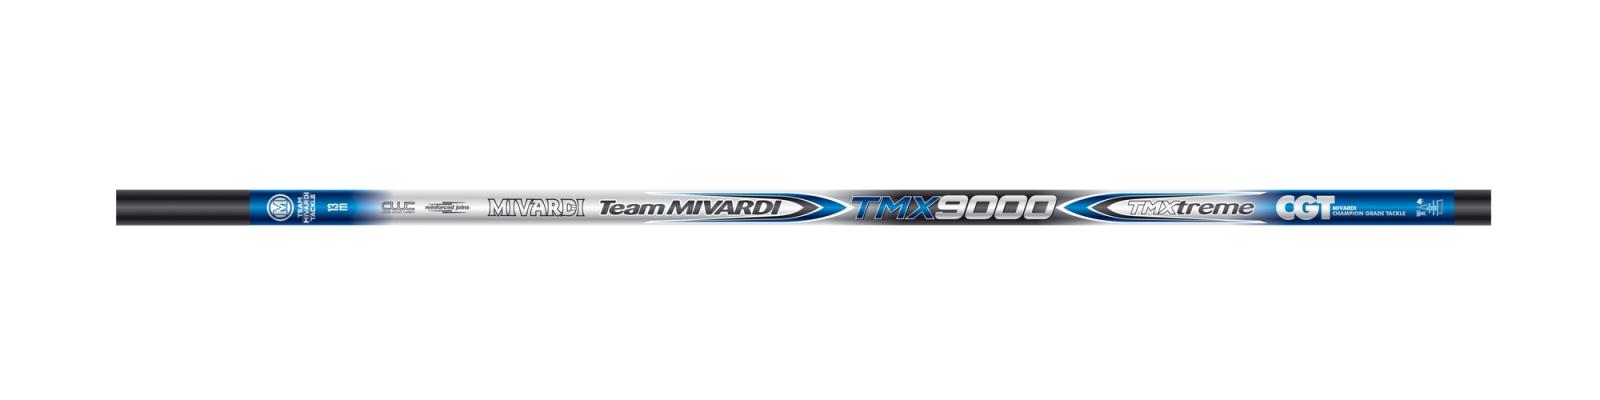 Topset na děličku Team Mivardi TMX 9000 5 dílů